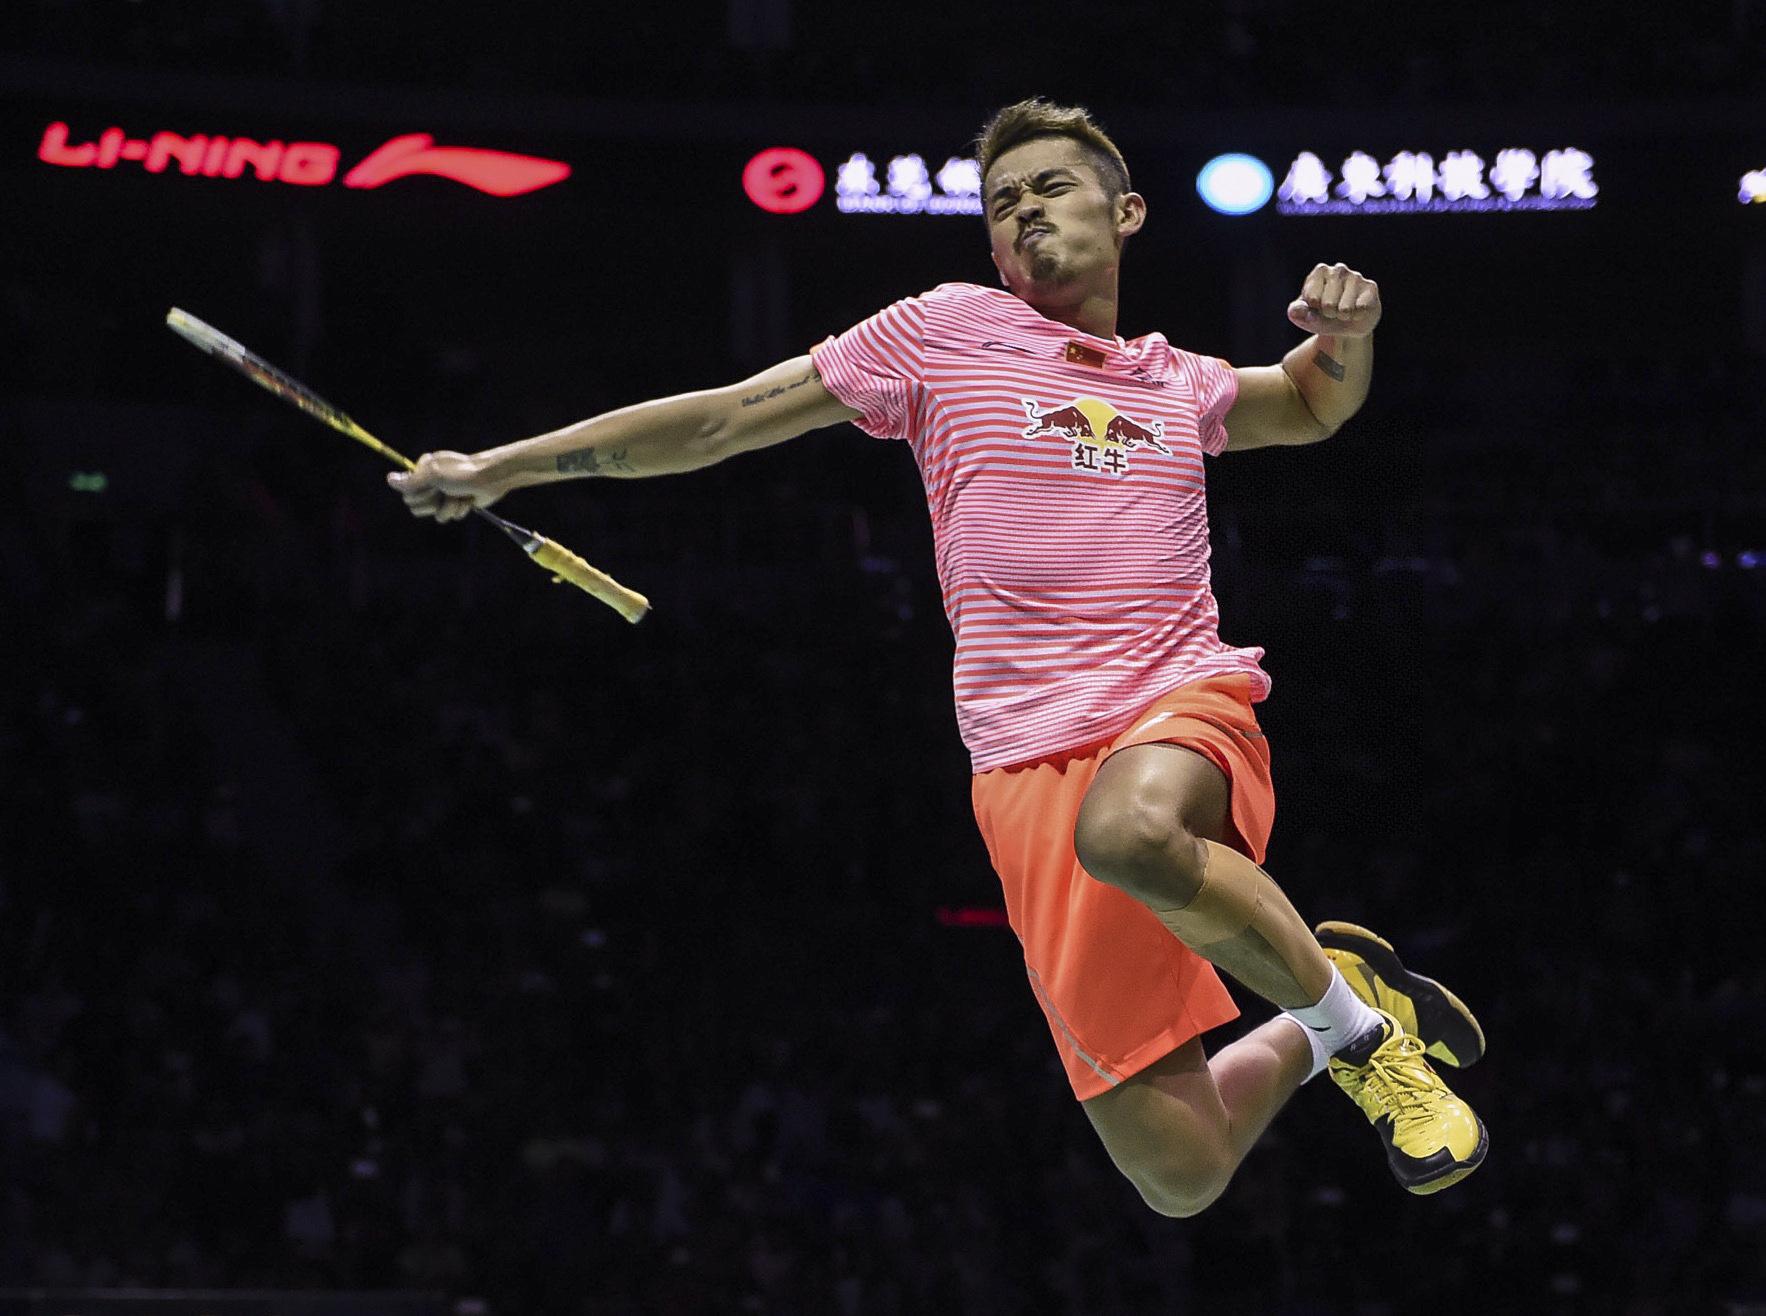 In 2004, Lin Dan was nicknamed 'Super Dan' by Danish Peter Gade after winning the All England final. (Credits: Twitter/ Xinhua Sports)